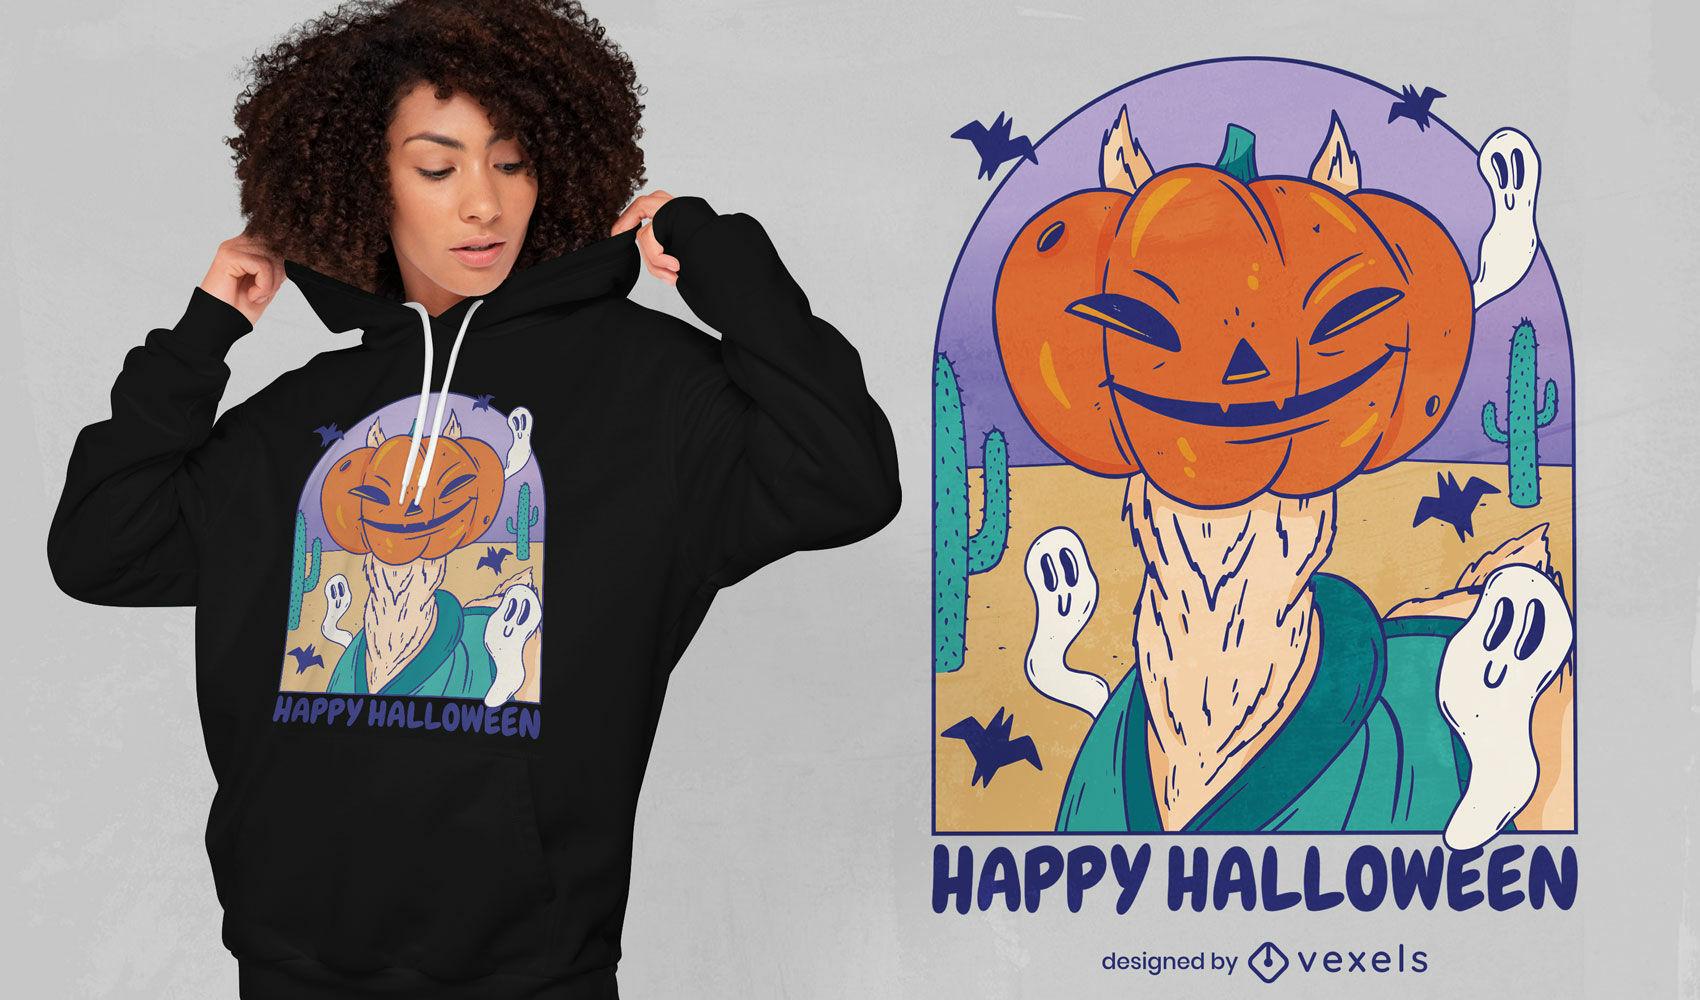 Genial dise?o de camiseta de alpaca de Halloween